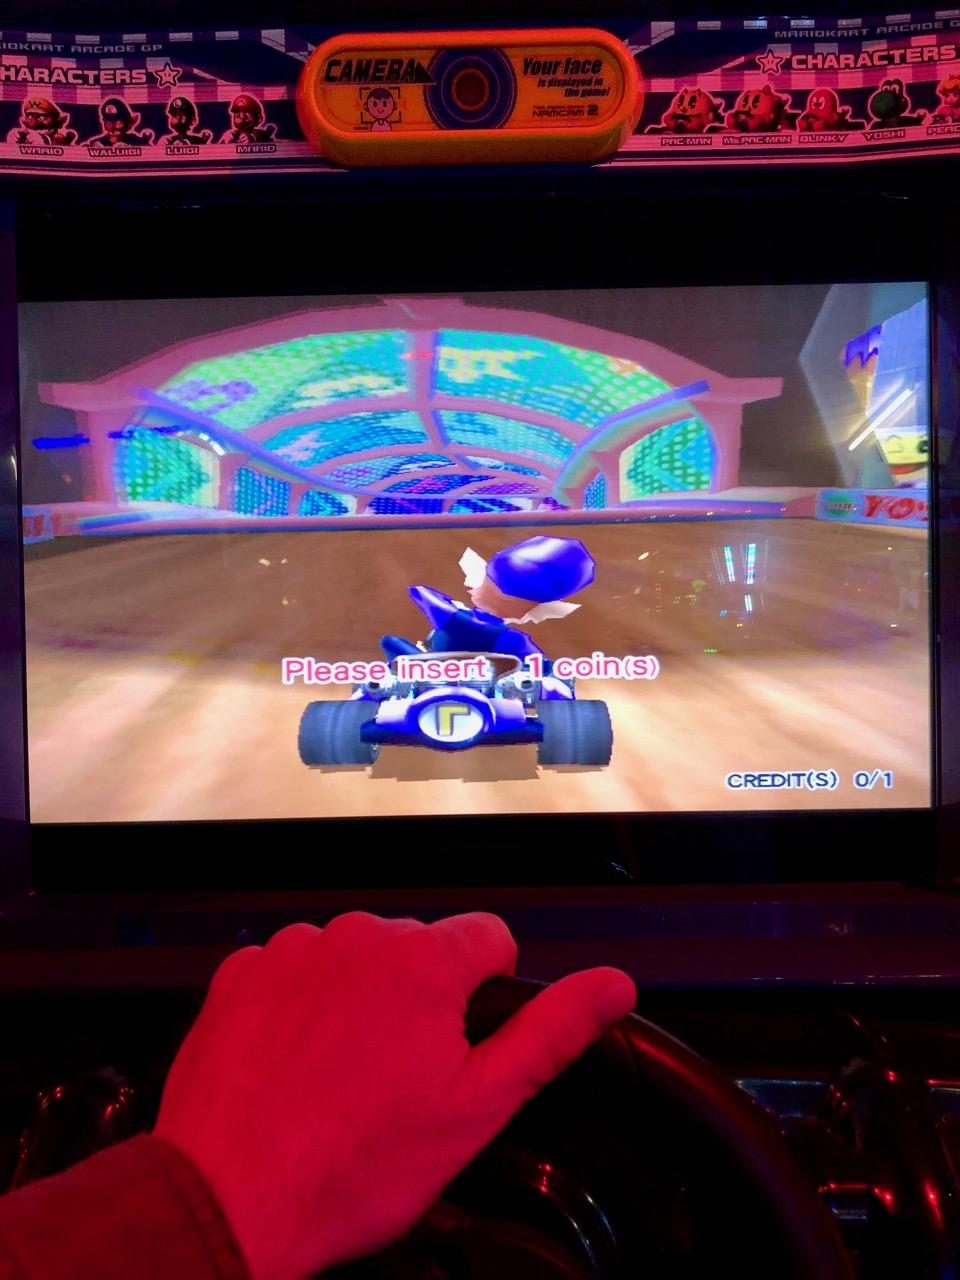 Let's Go! Mario Kart 2 Arcade GP in Aktion. (Bild: André Eymann)